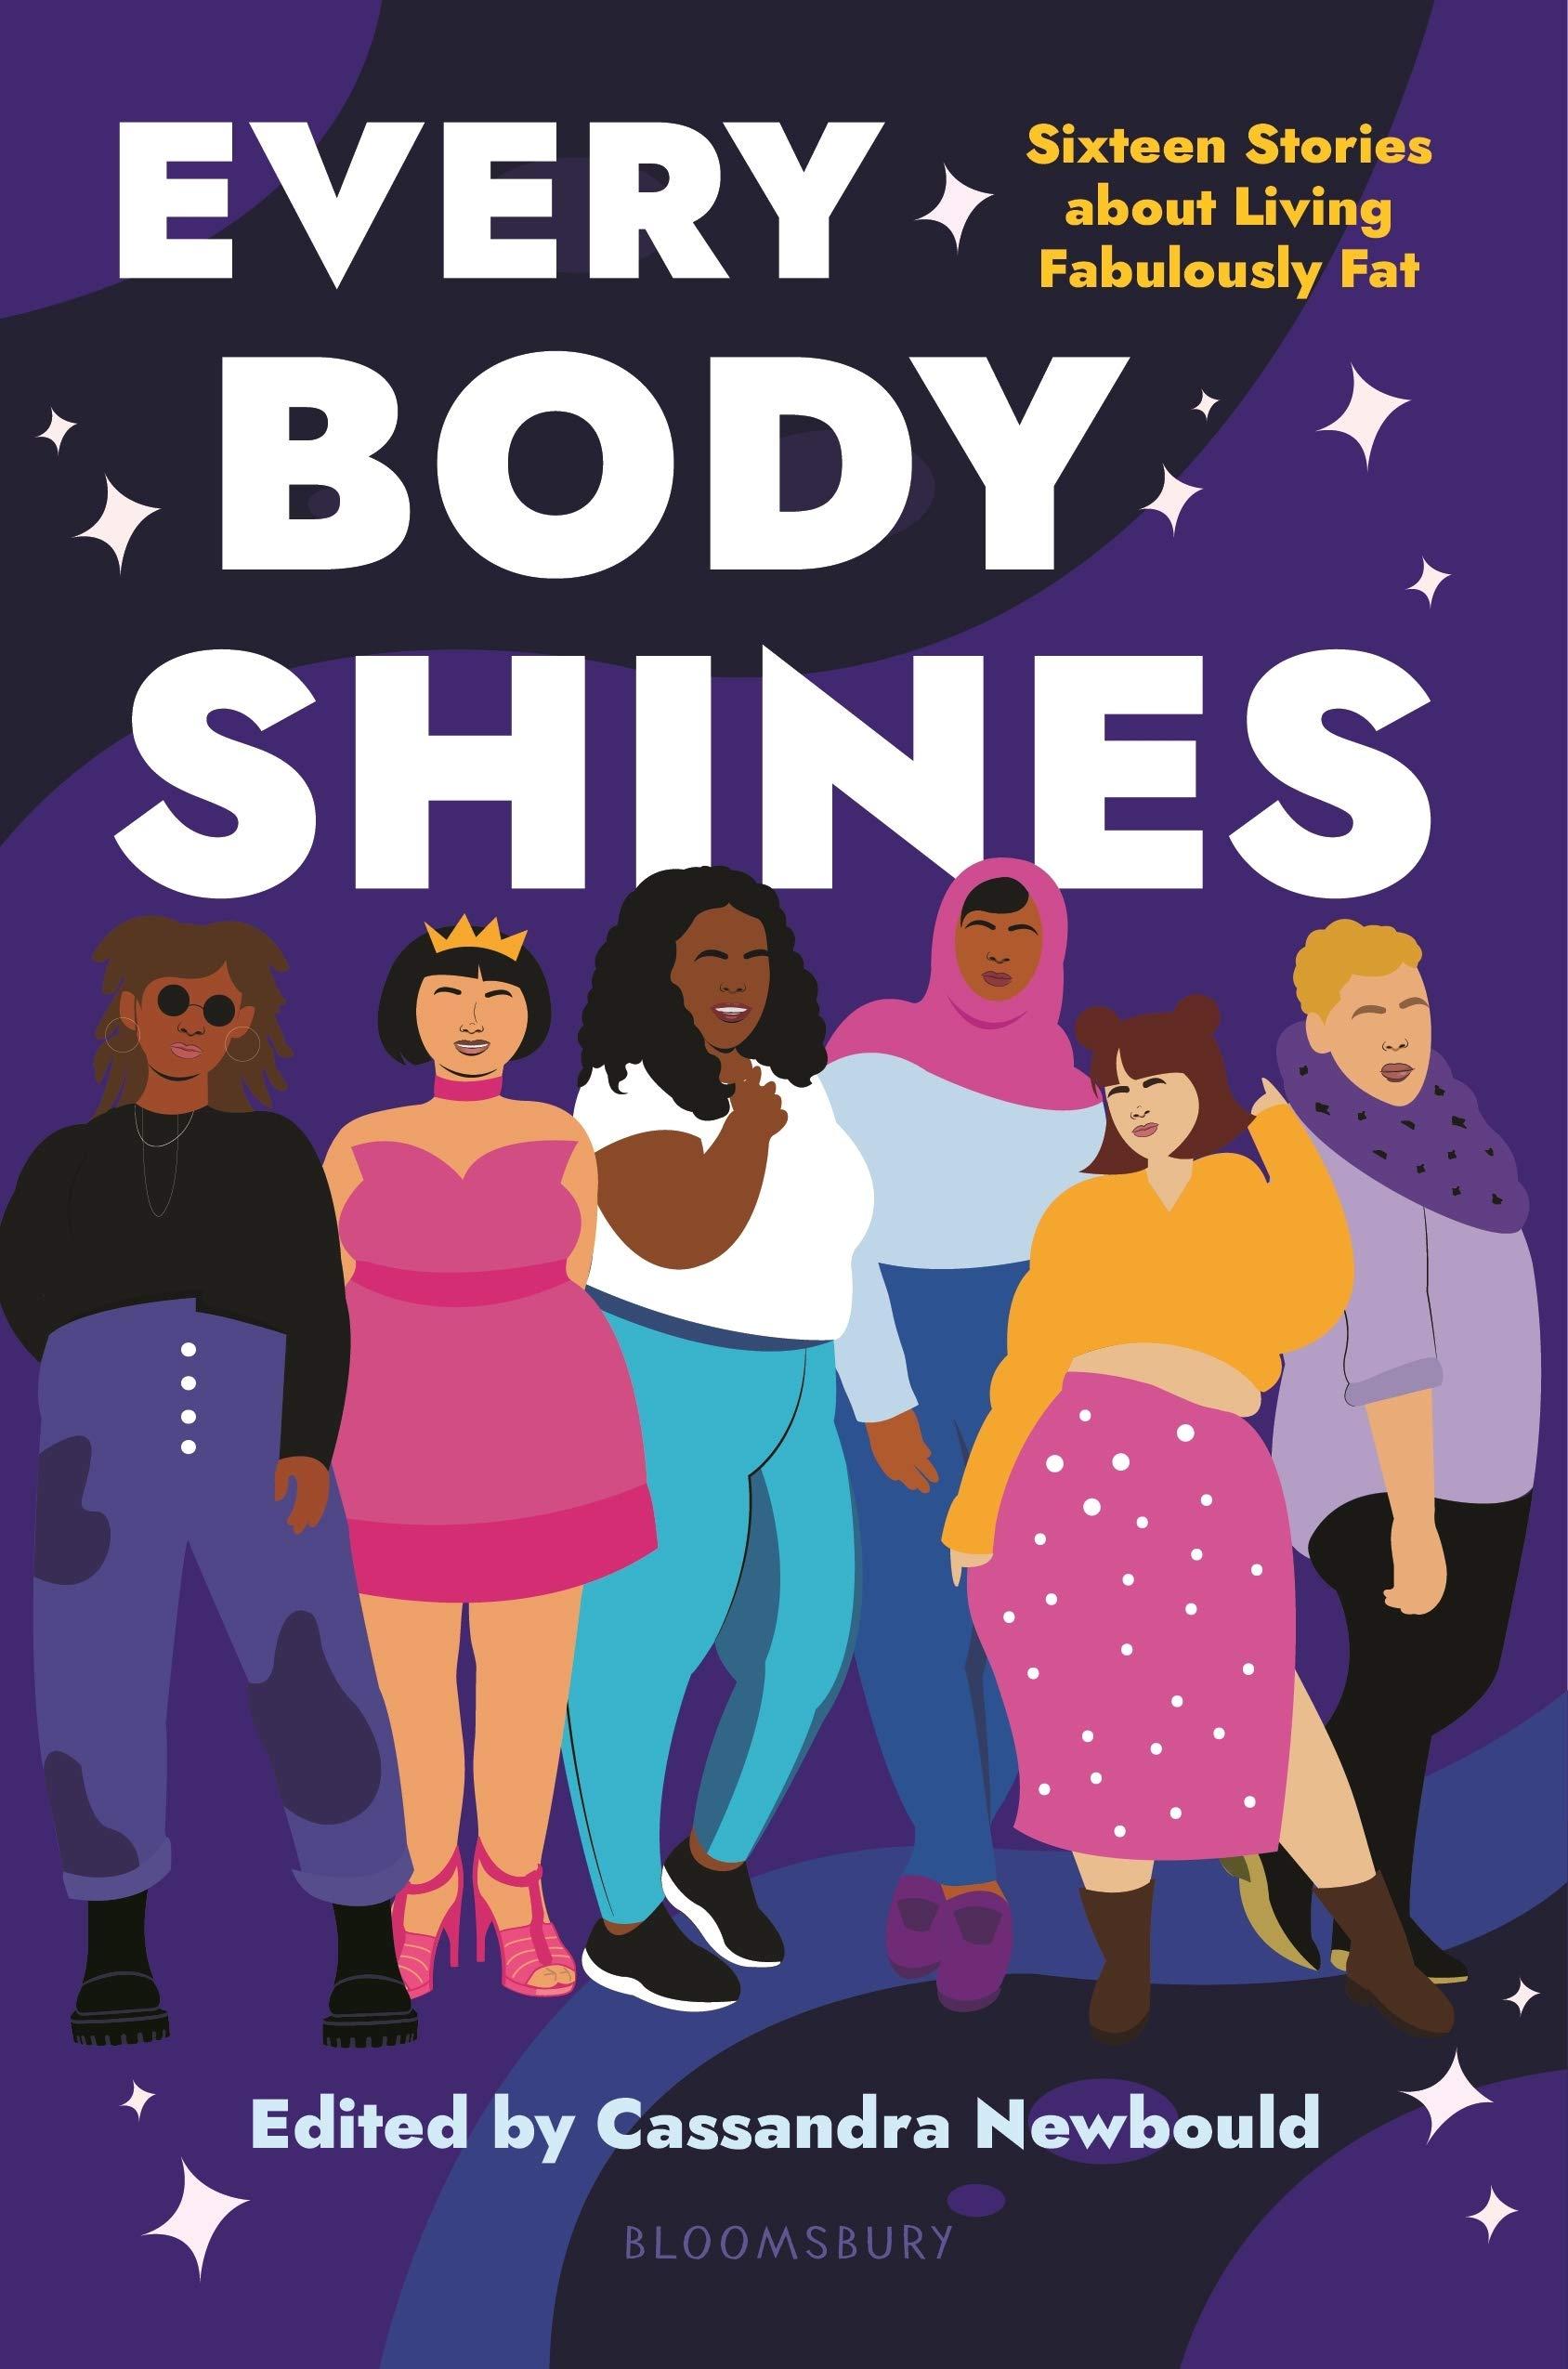 Amazon.com: Every Body Shines: Sixteen Stories About Living Fabulously Fat:  9781547606078: Newbould, Cassandra: Books